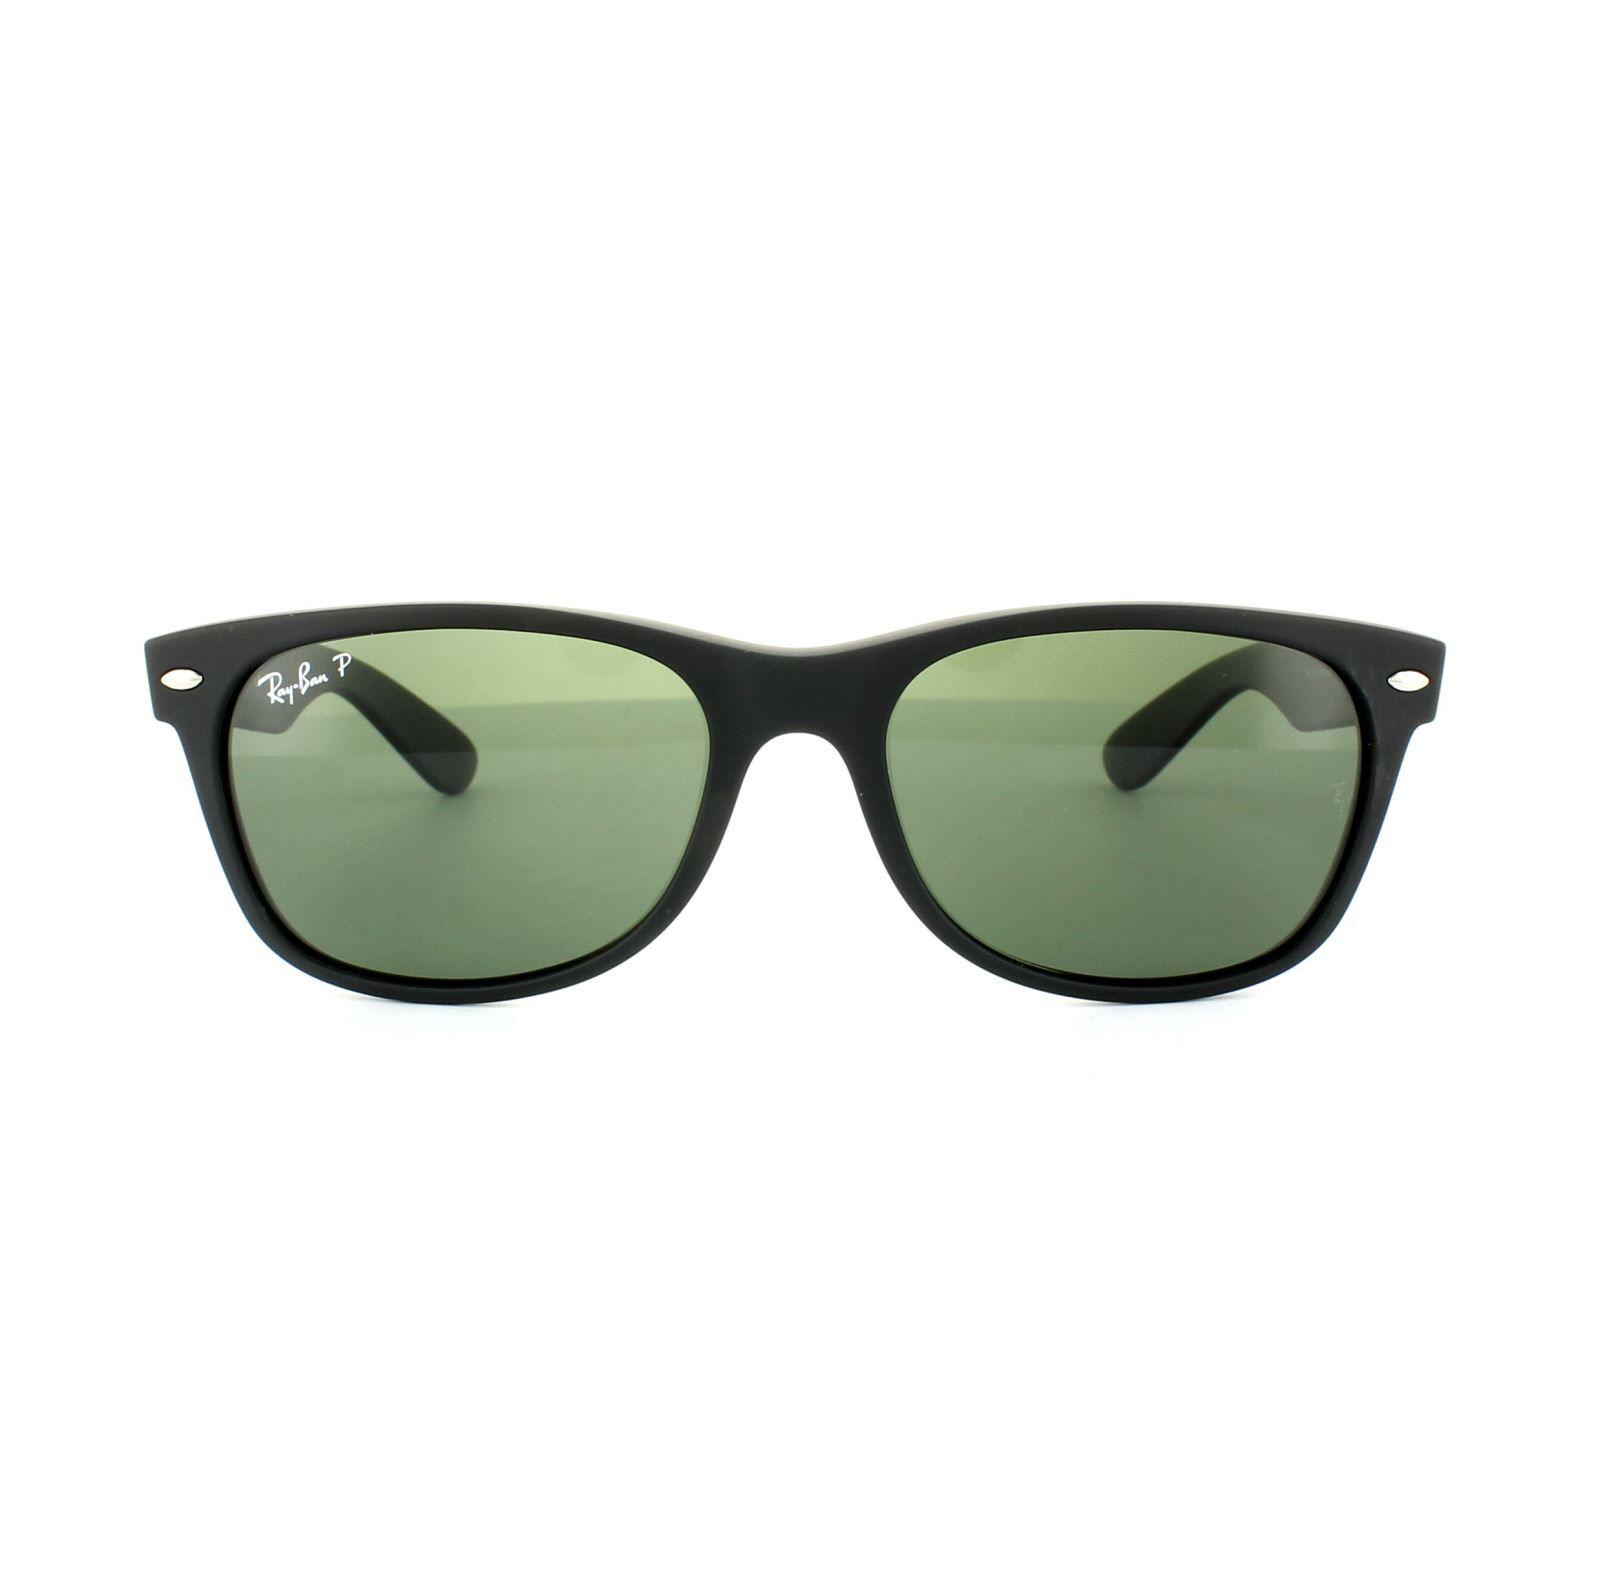 Ray-Ban Sunglasses New Wayfarer 2132 622/58 Rubber Black Green Polarized 55mm